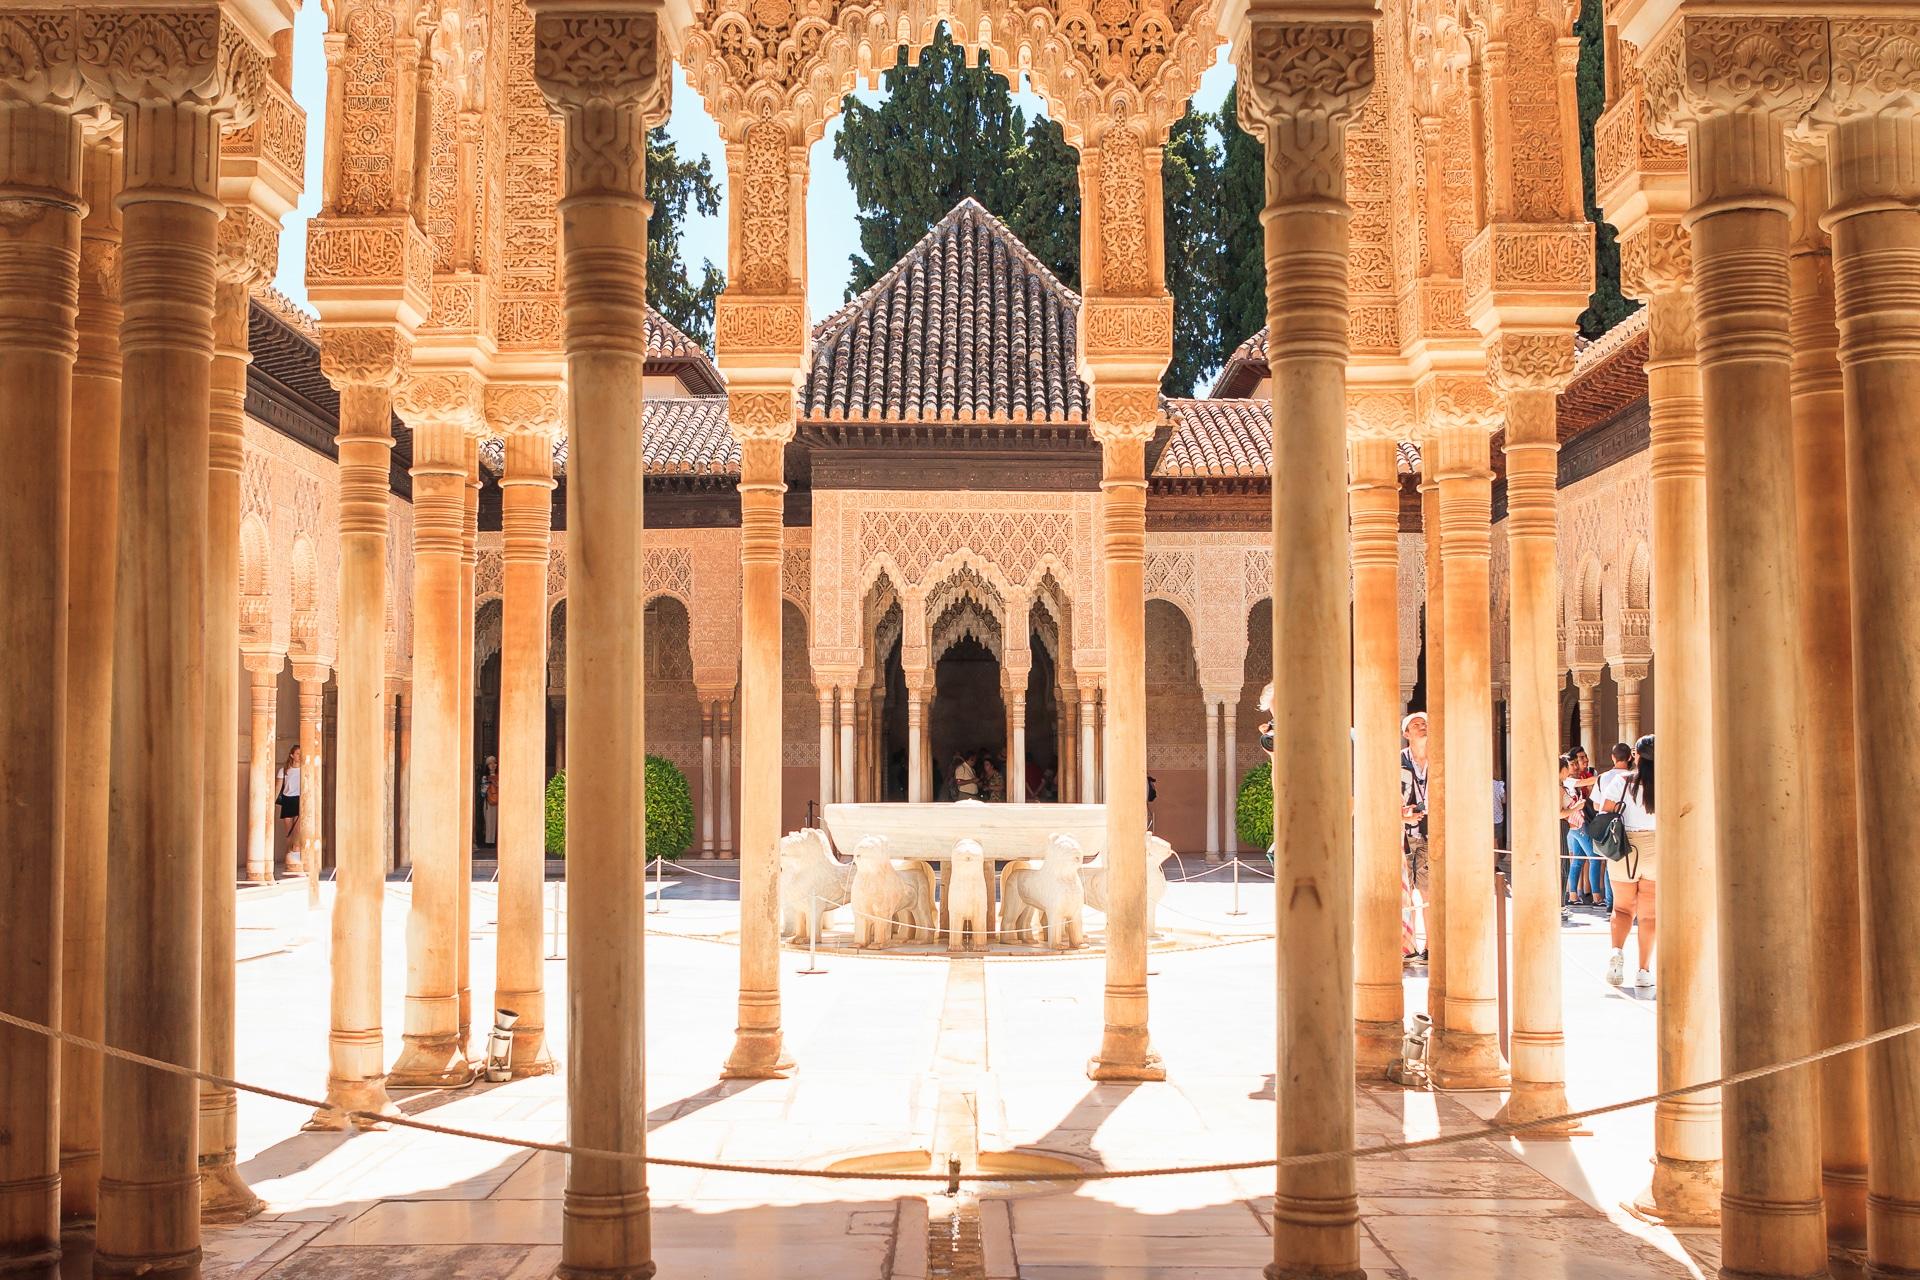 Excursion in Granada - Tours in Andalucia